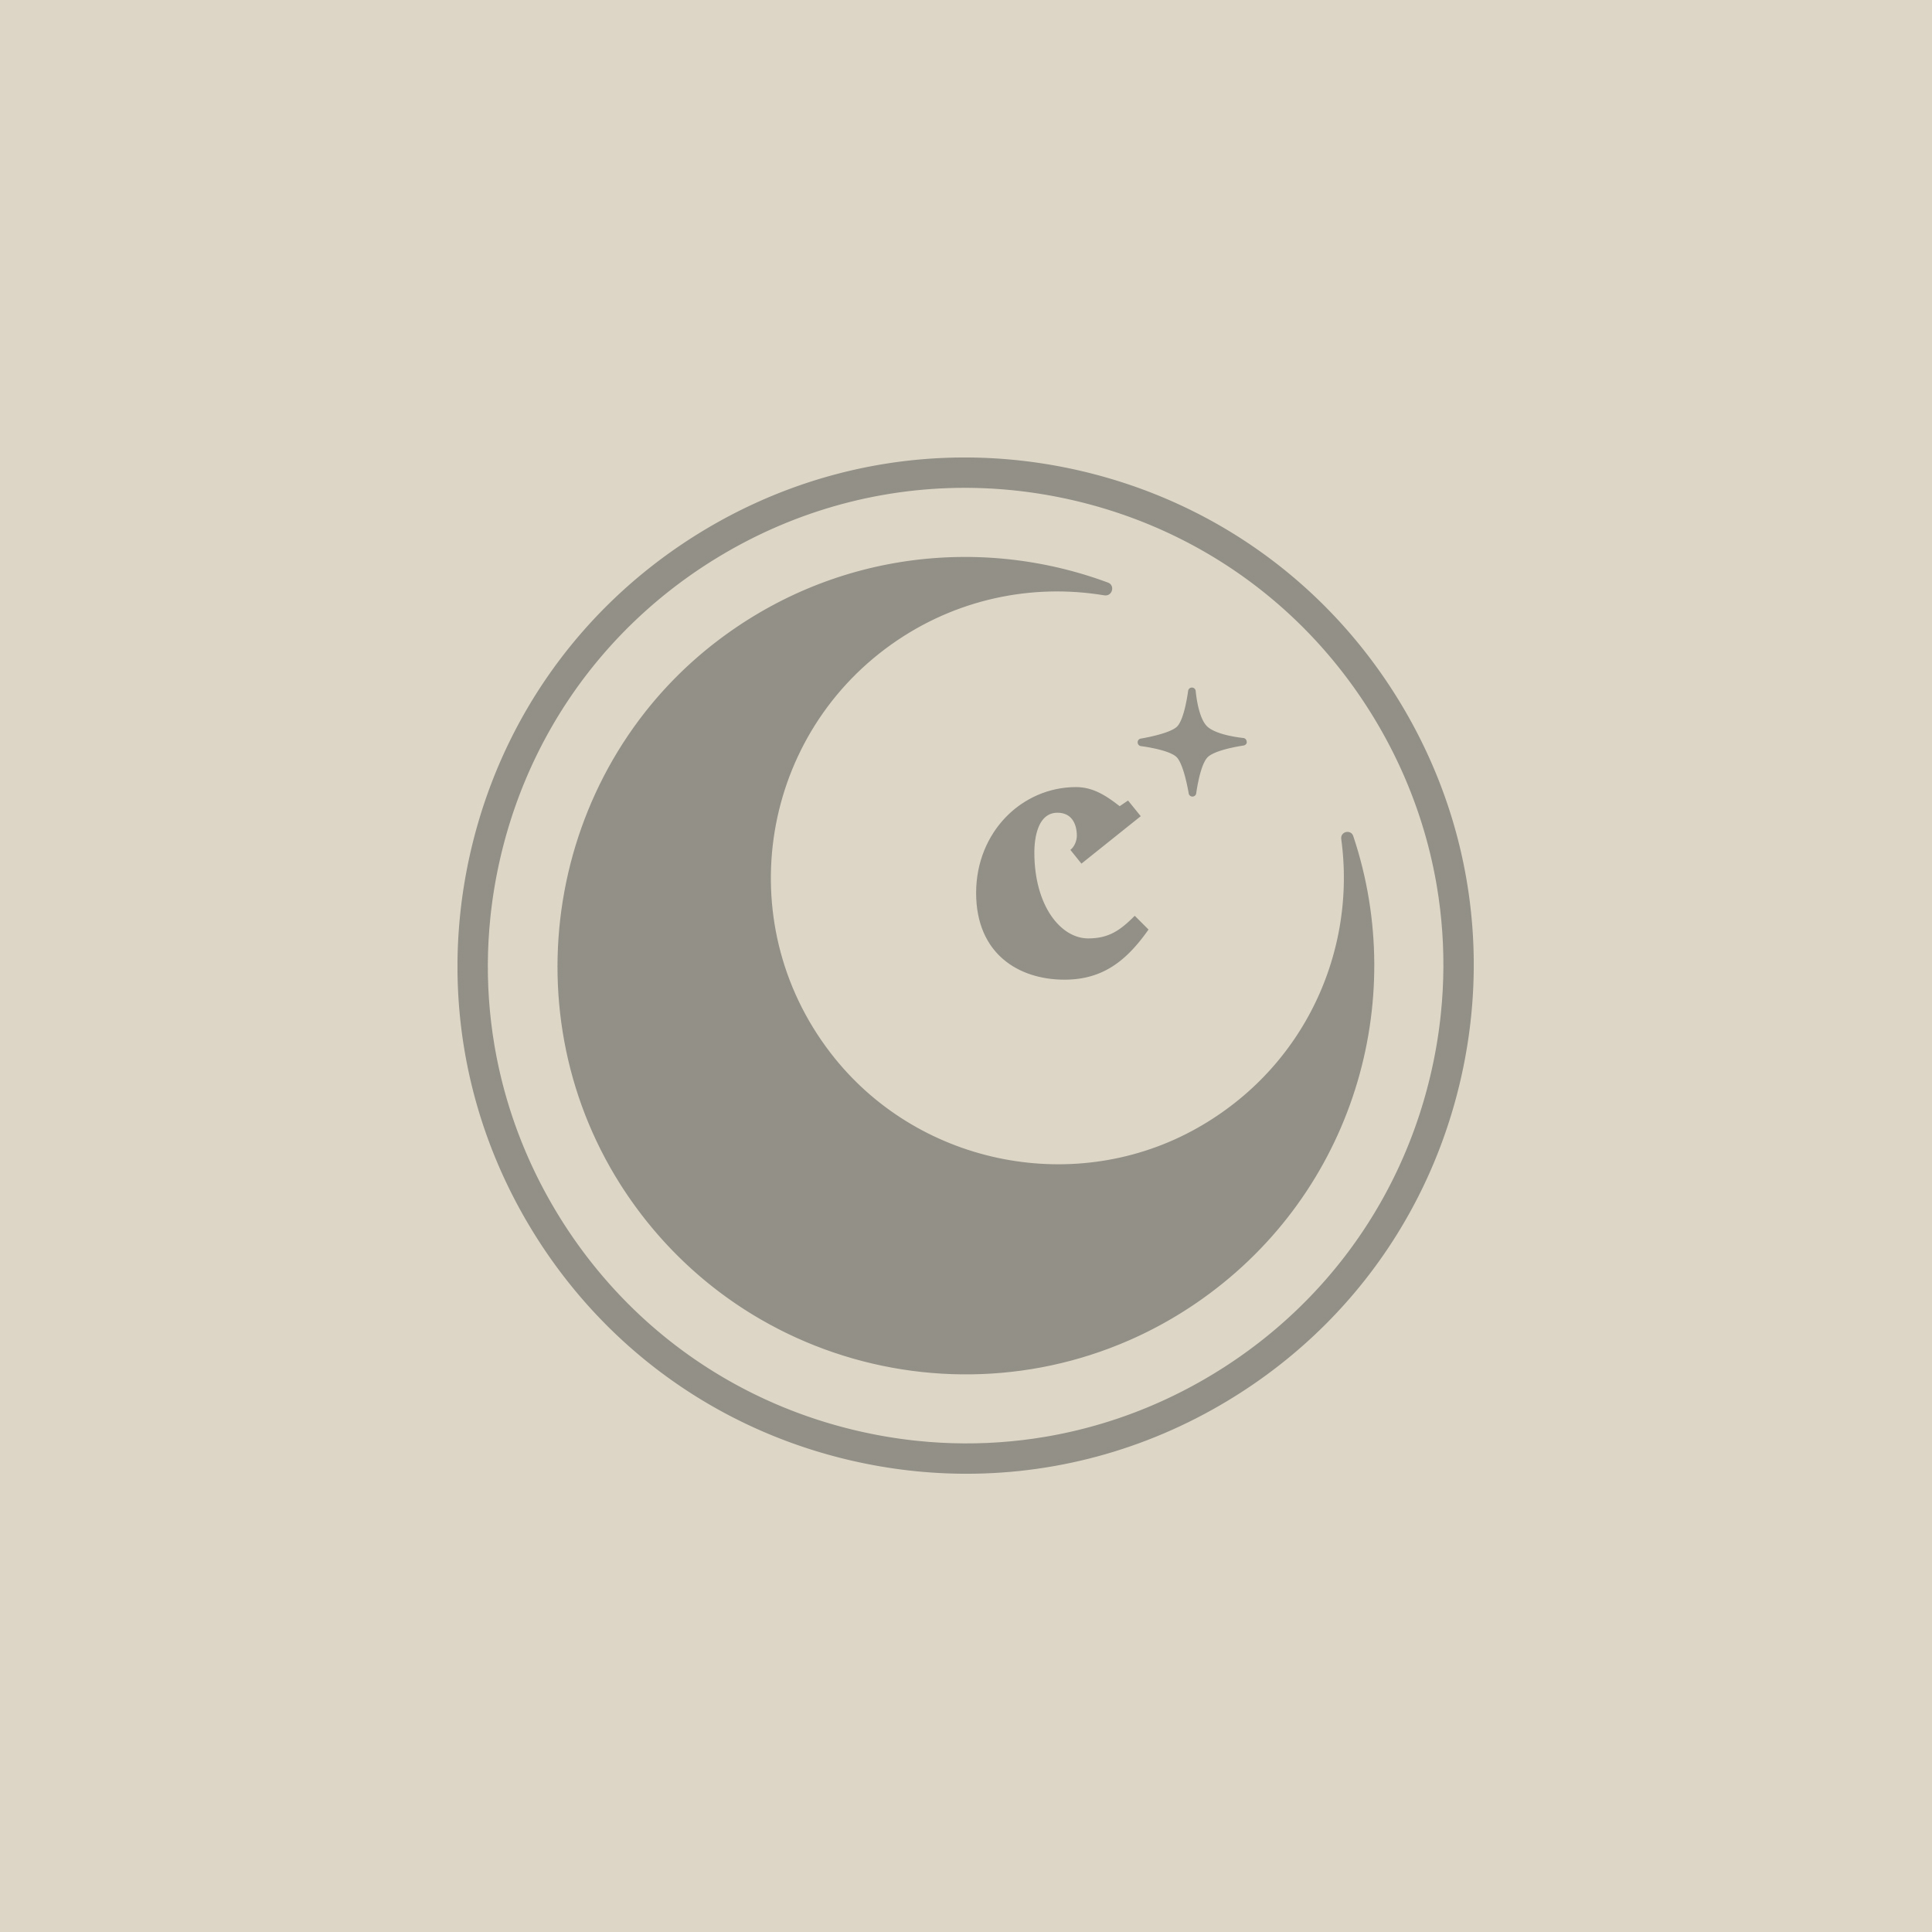 logos_0042_corruption_5.jpg